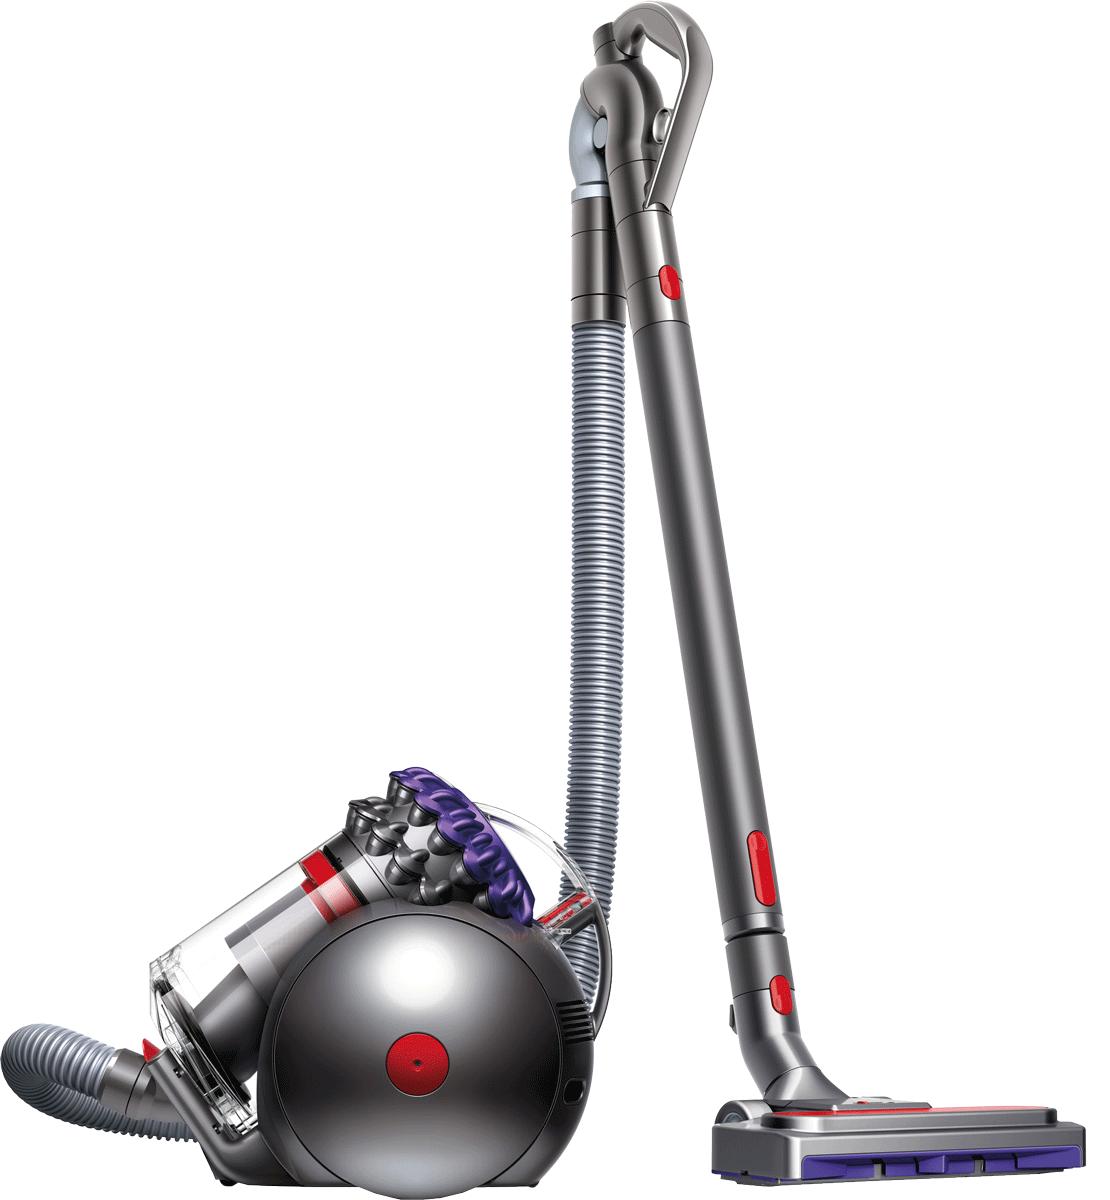 dyson big ball parquet 2 aspirateur sans sac aspirateurs tra naux sans sac acheter bas. Black Bedroom Furniture Sets. Home Design Ideas